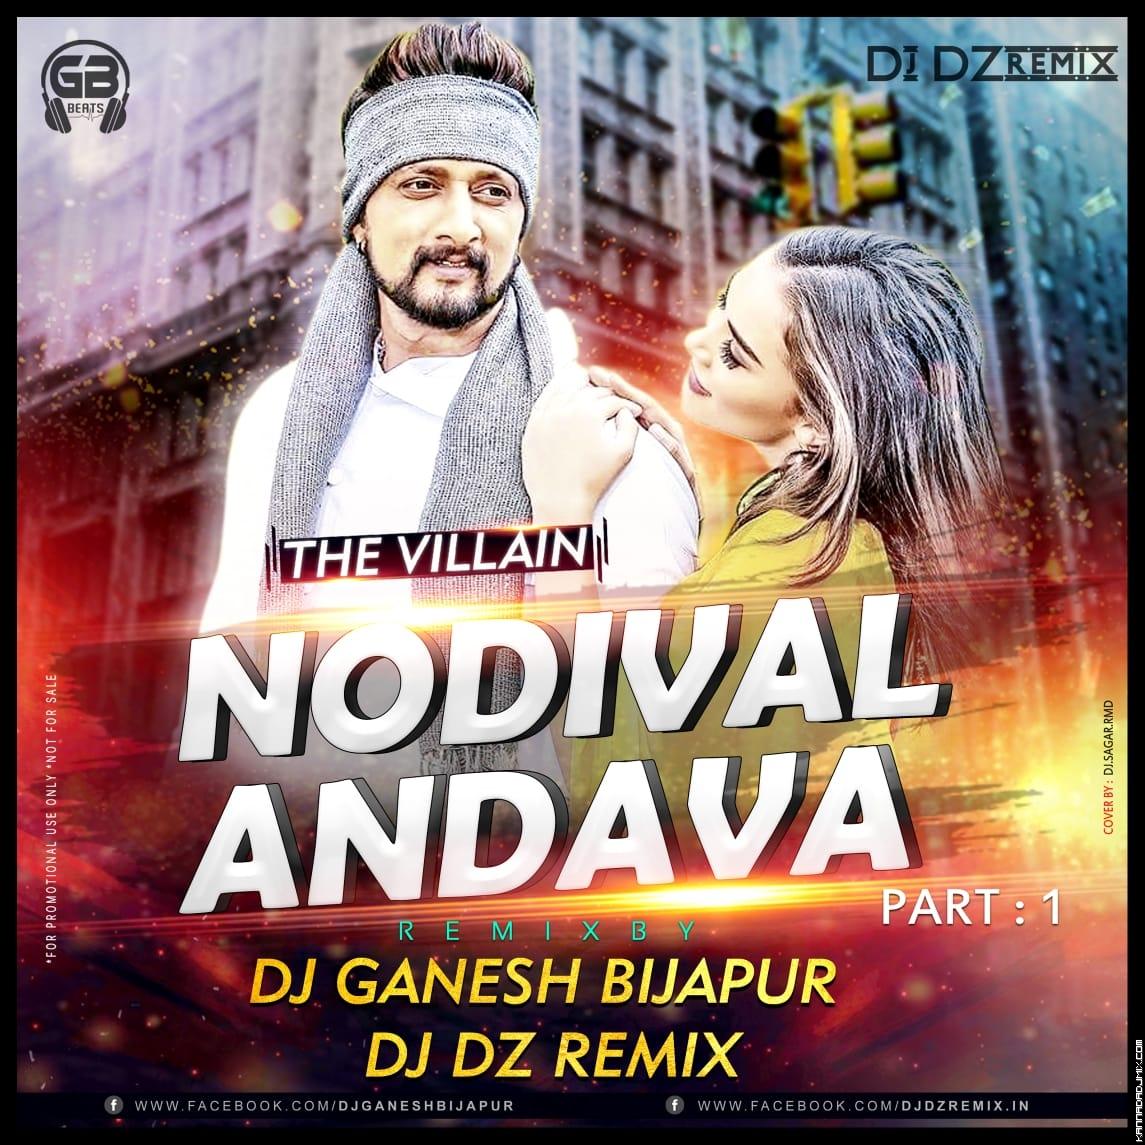 NODIVALANDAVA [THE VILLAIN]  REMIX  DJ GANESH [BIJAPUR] AND DZ REMIX.mp3